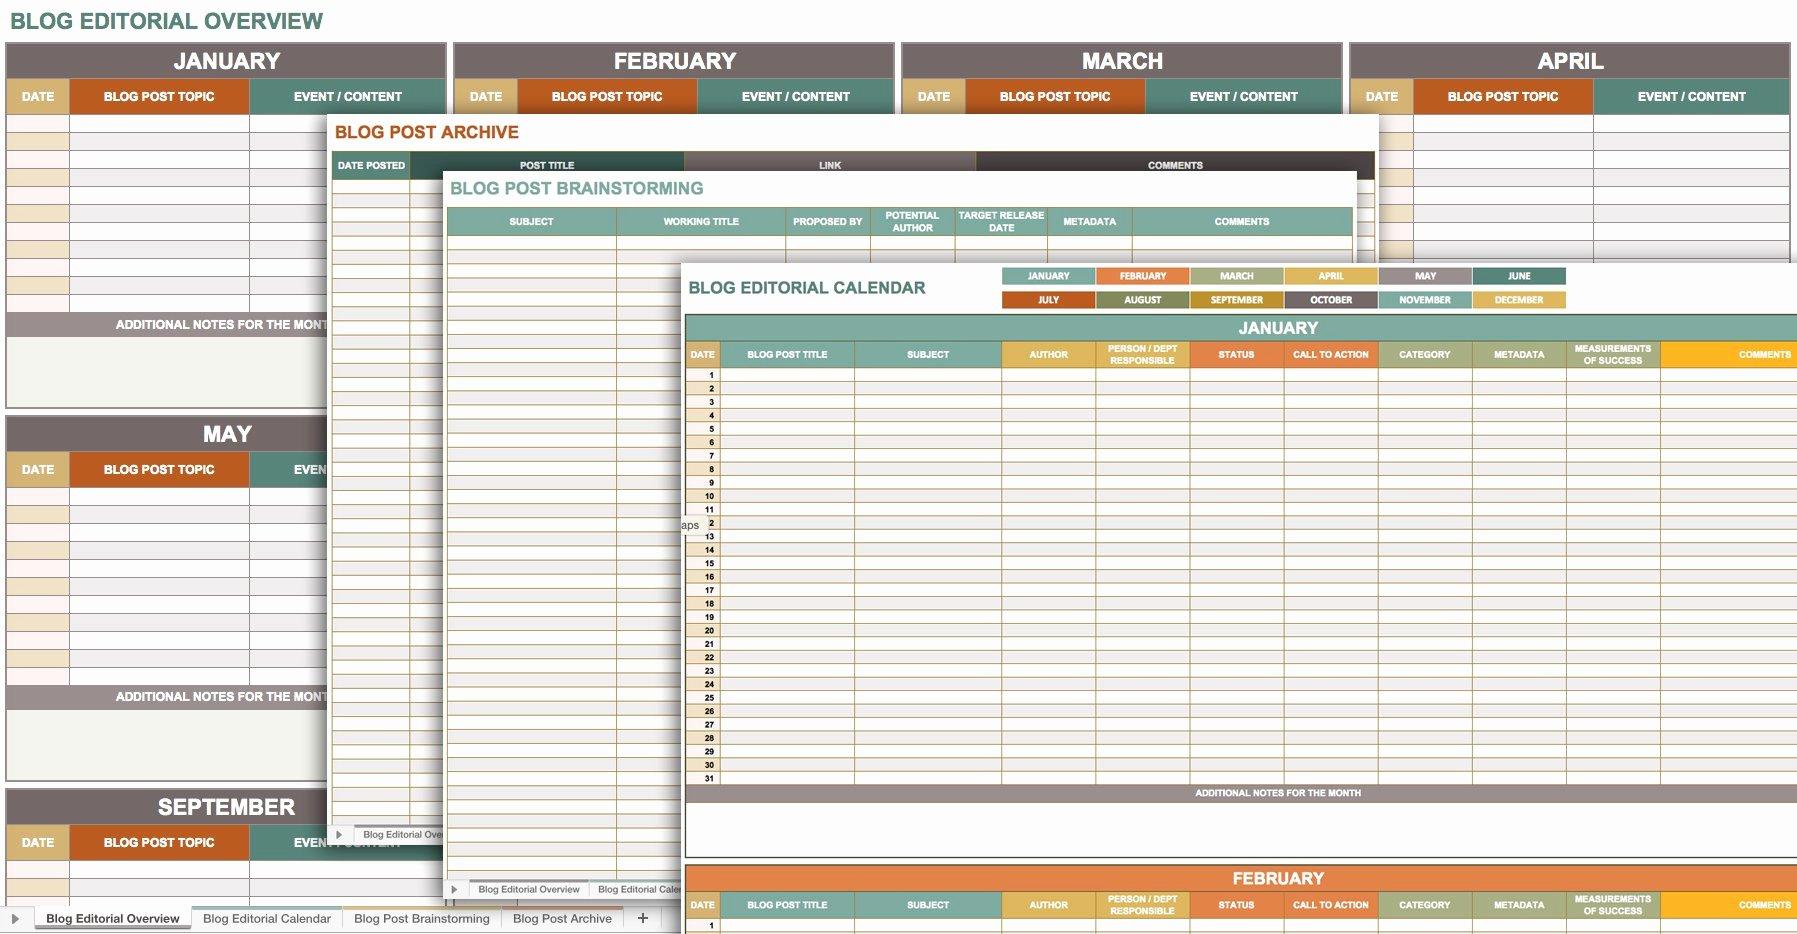 Excel Calendar Schedule Template New Free Marketing Plan Templates for Excel Smartsheet